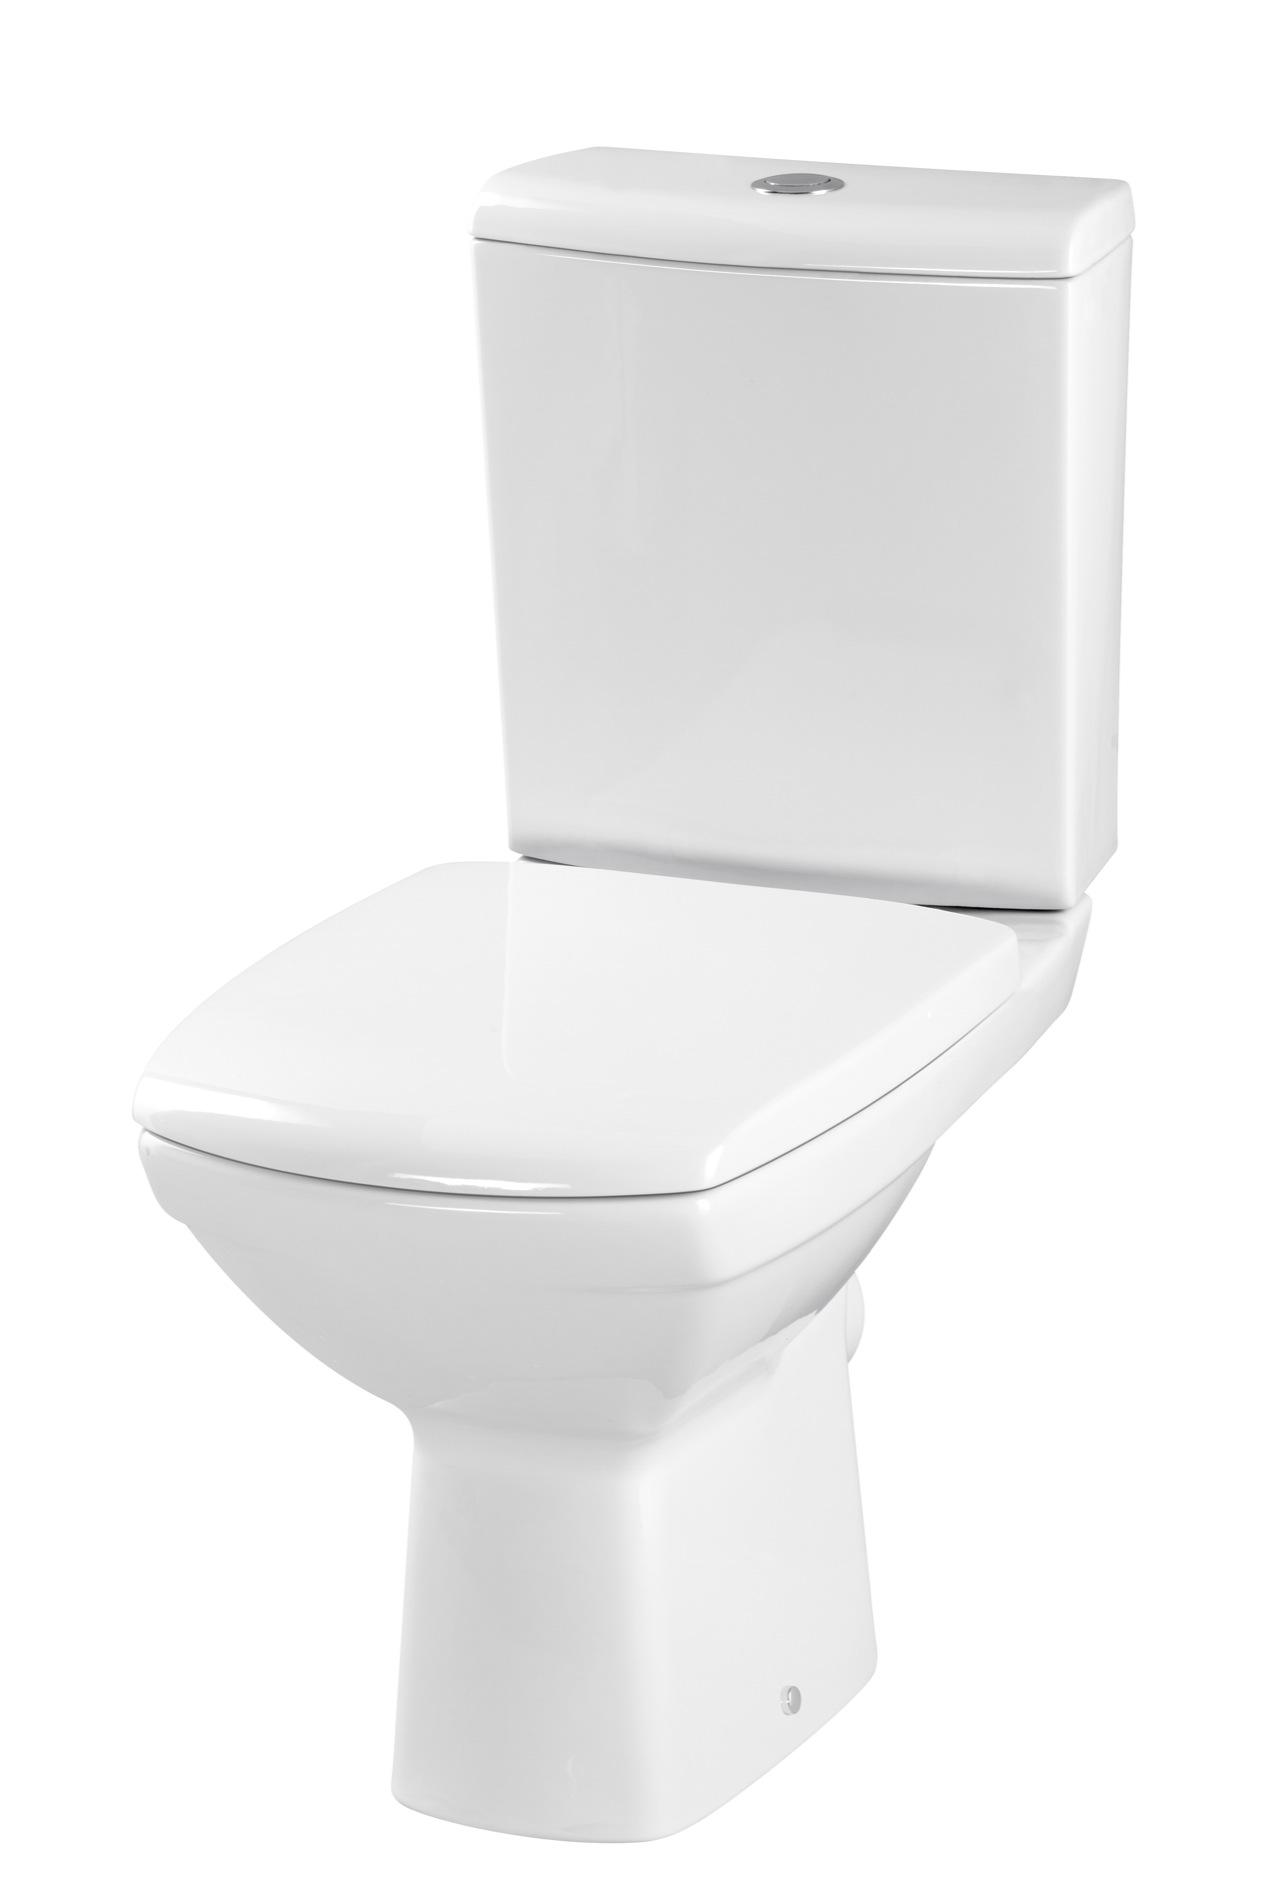 domino keramik stand wc toilette 68490 tiefsp ler bodenstehend ebay. Black Bedroom Furniture Sets. Home Design Ideas